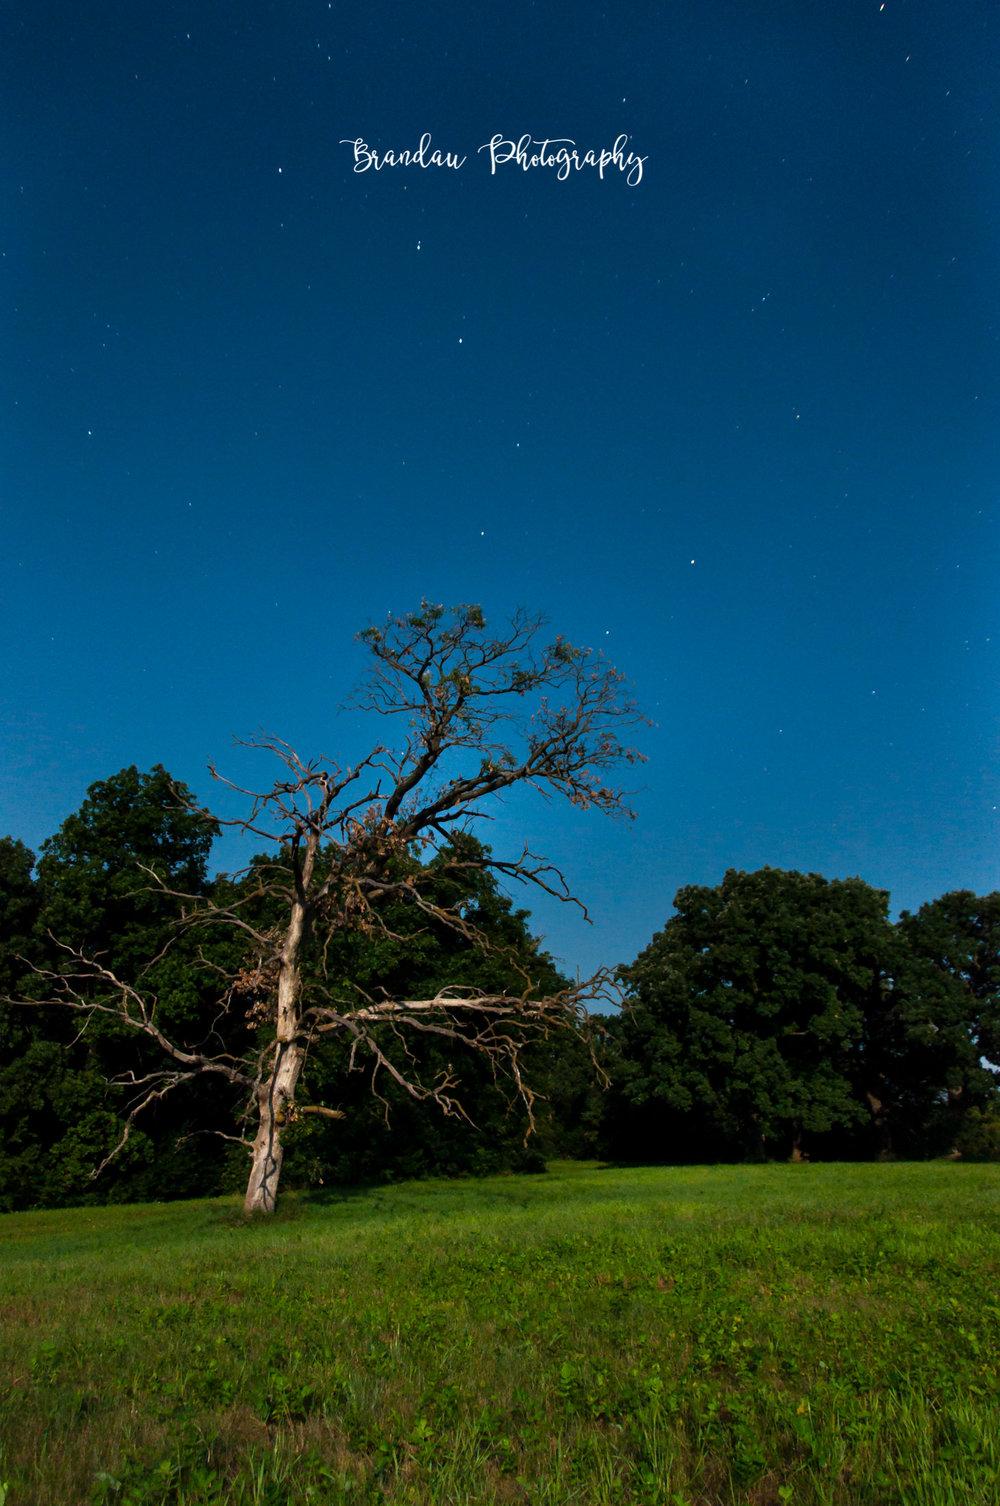 Brandau Photography - Big Dipper - North Star - Old Tree - Iowa